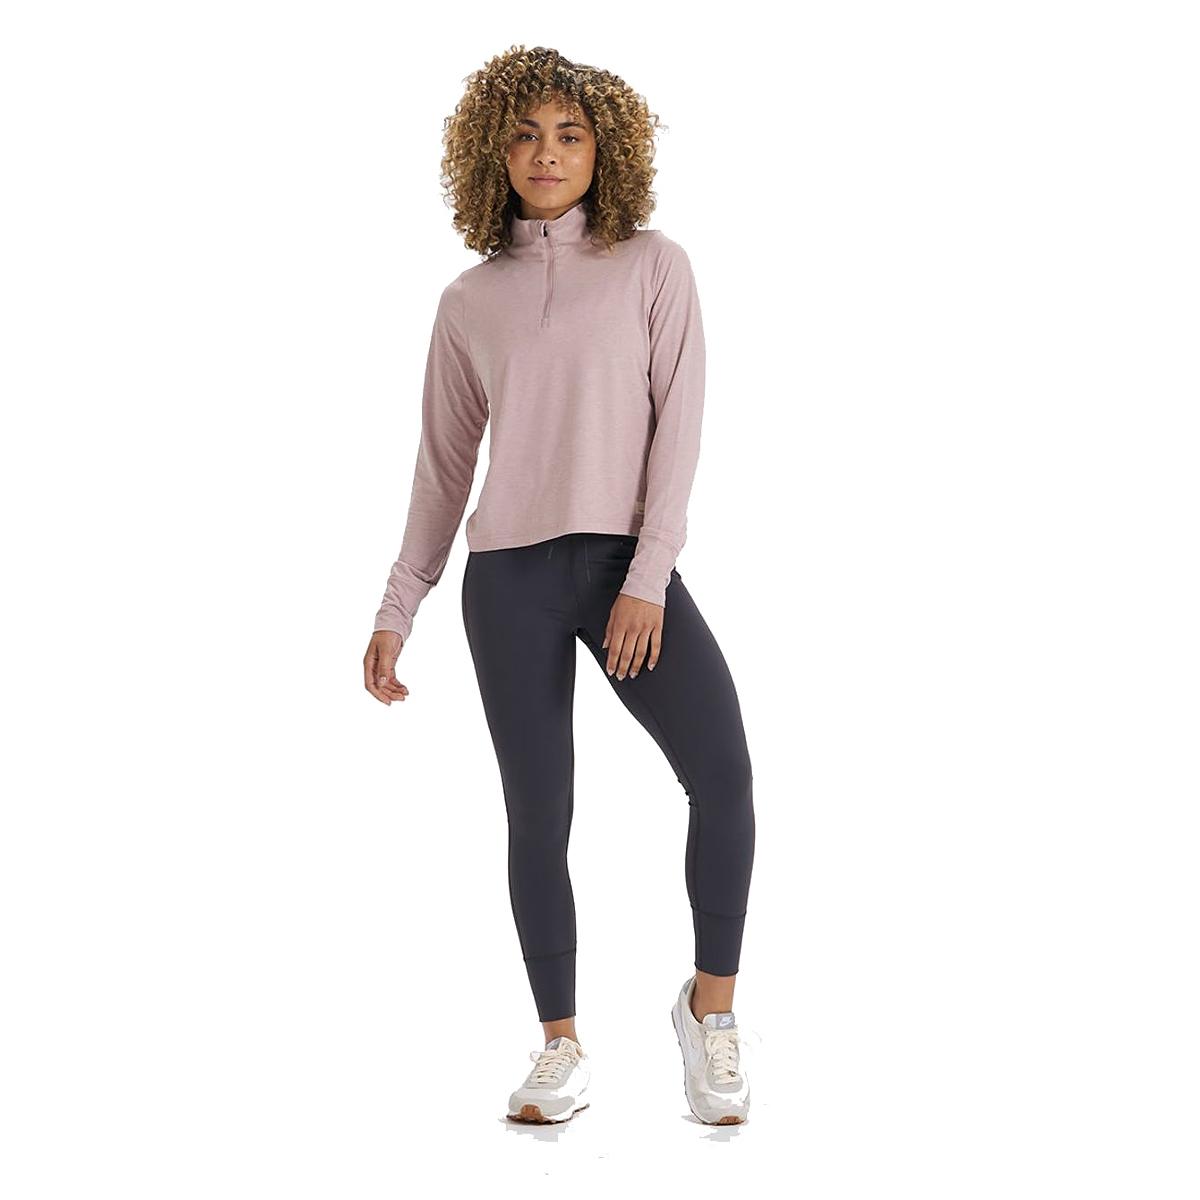 Women's Vuori Crescent Half Zip - Color: Dusk Heather - Size: XS, Dusk Heather, large, image 3